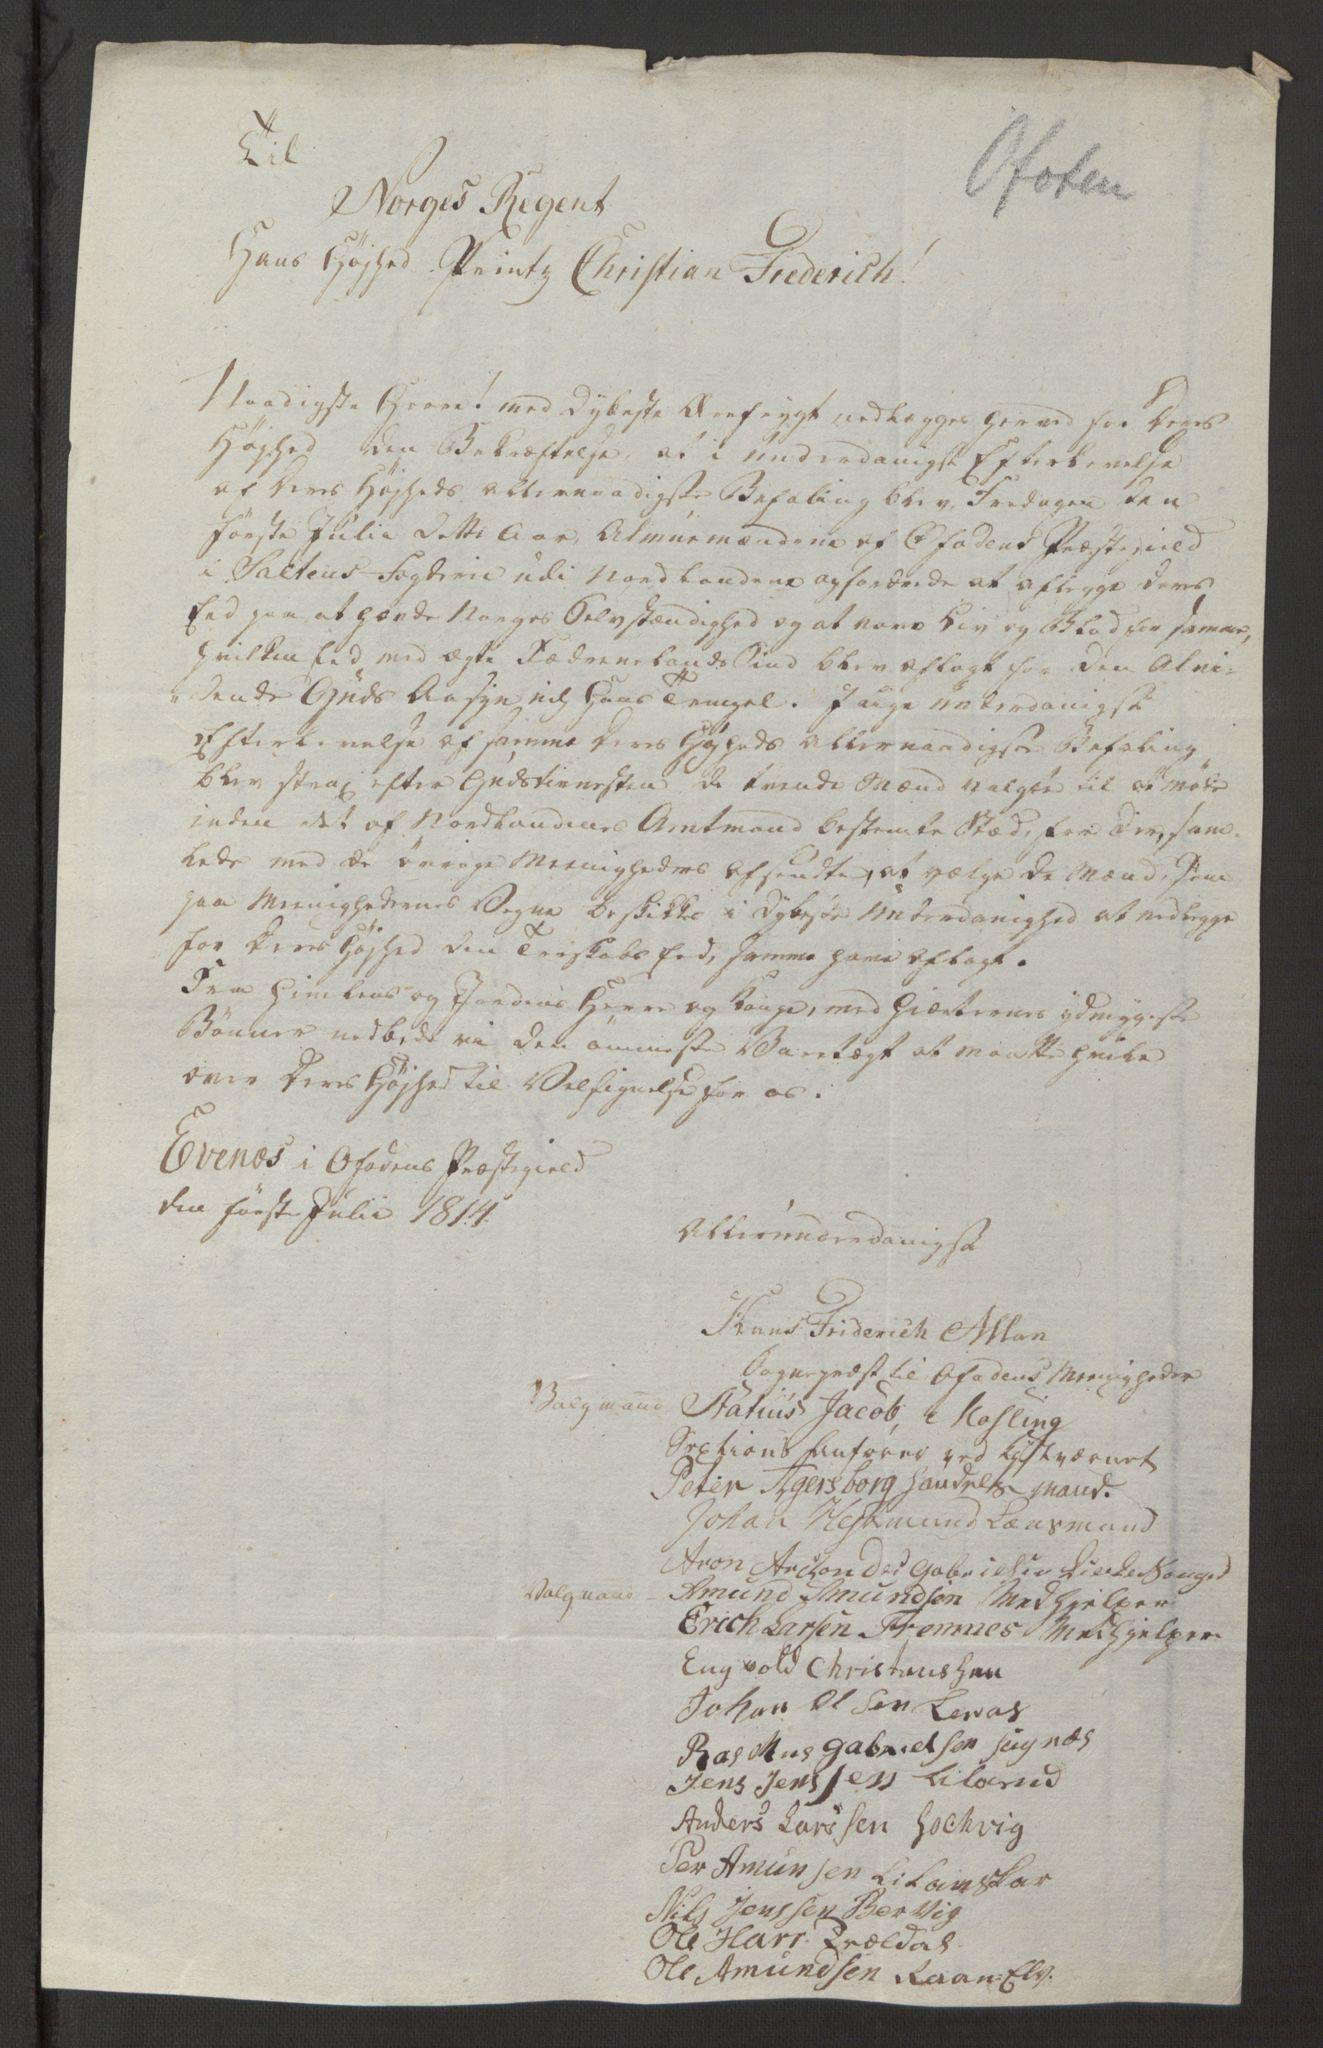 SAT, Nordland amt/fylke*, 1814, s. 38